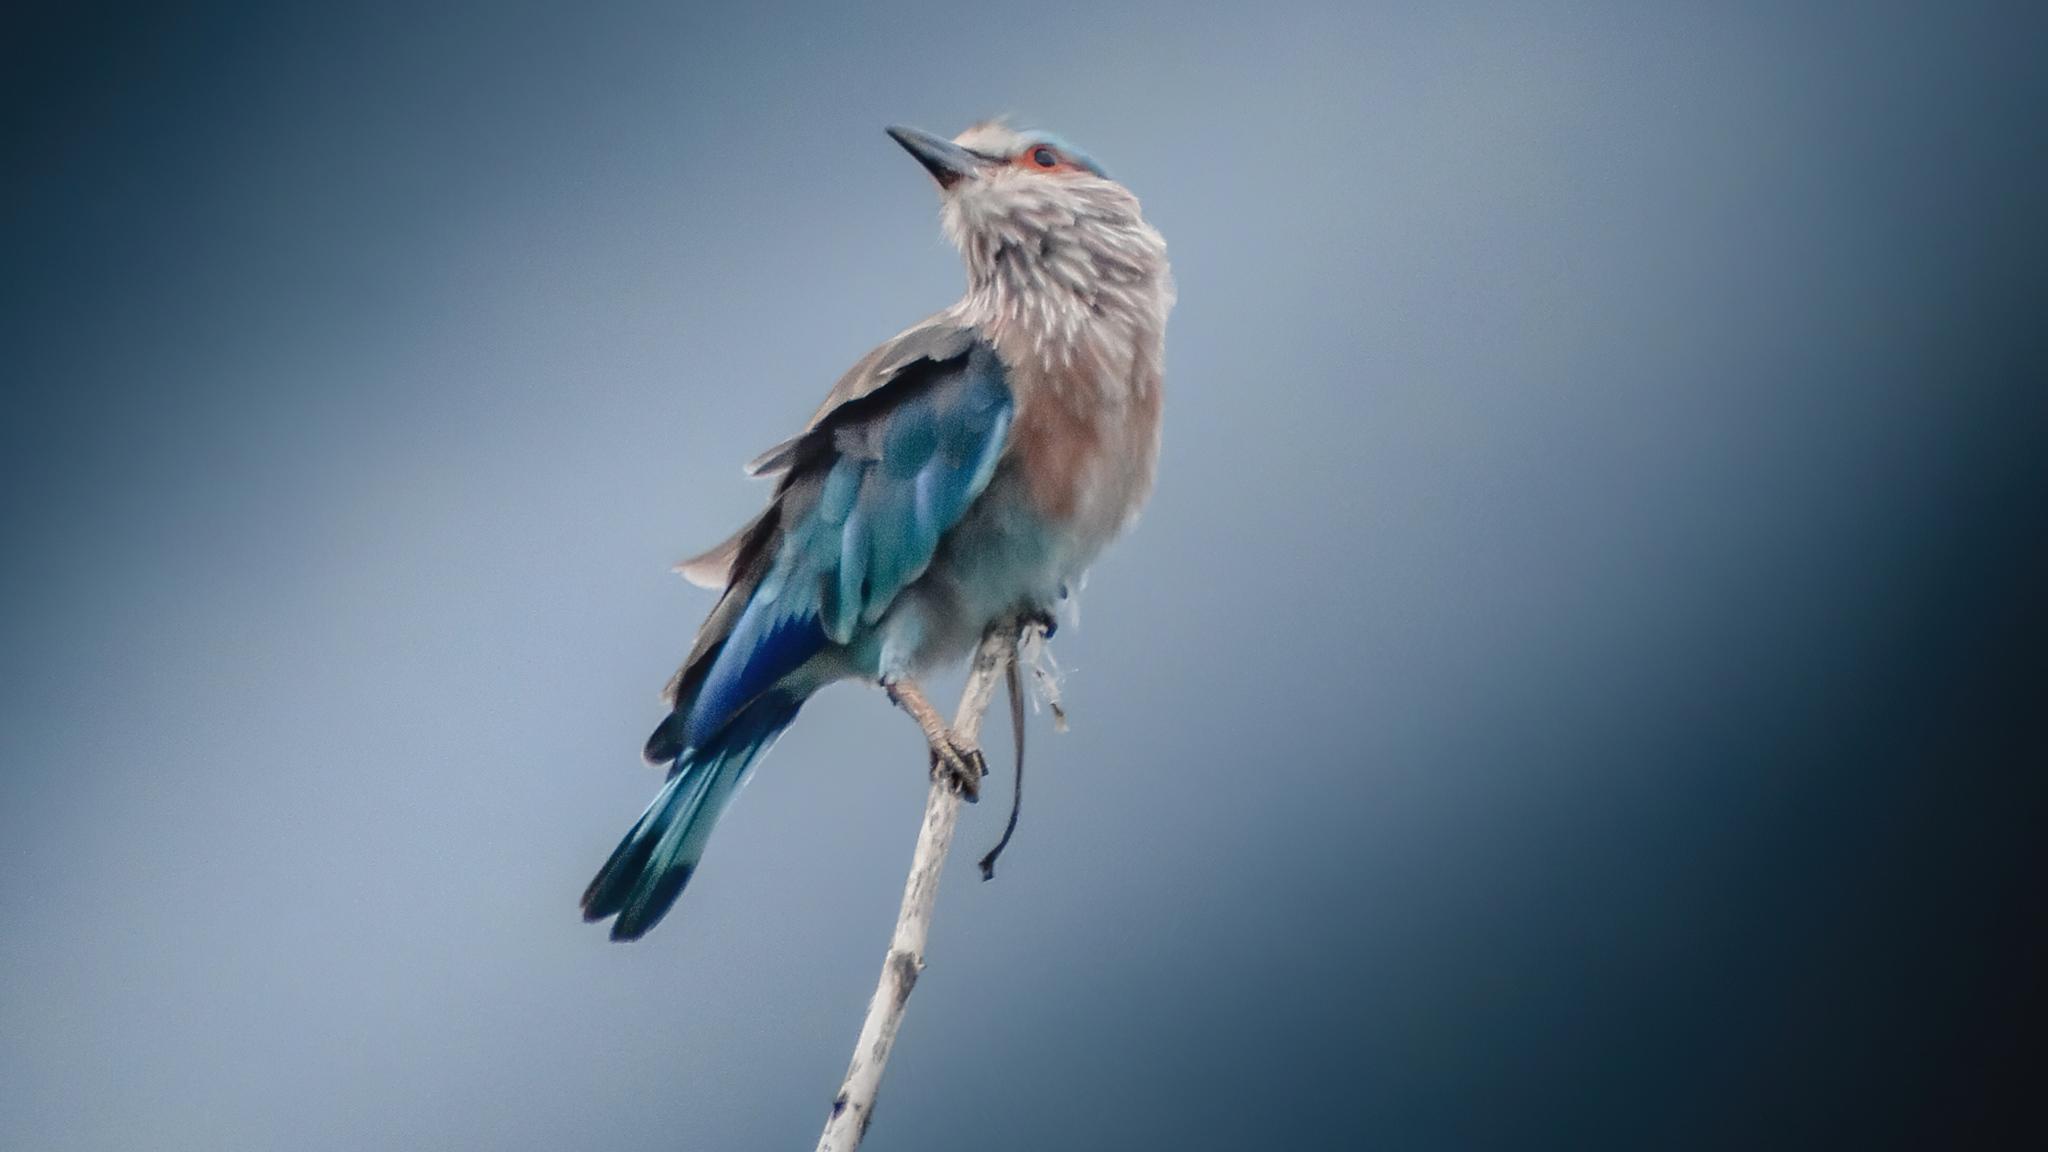 blue-and-brown-bird-on-tree-4k-bw.jpg